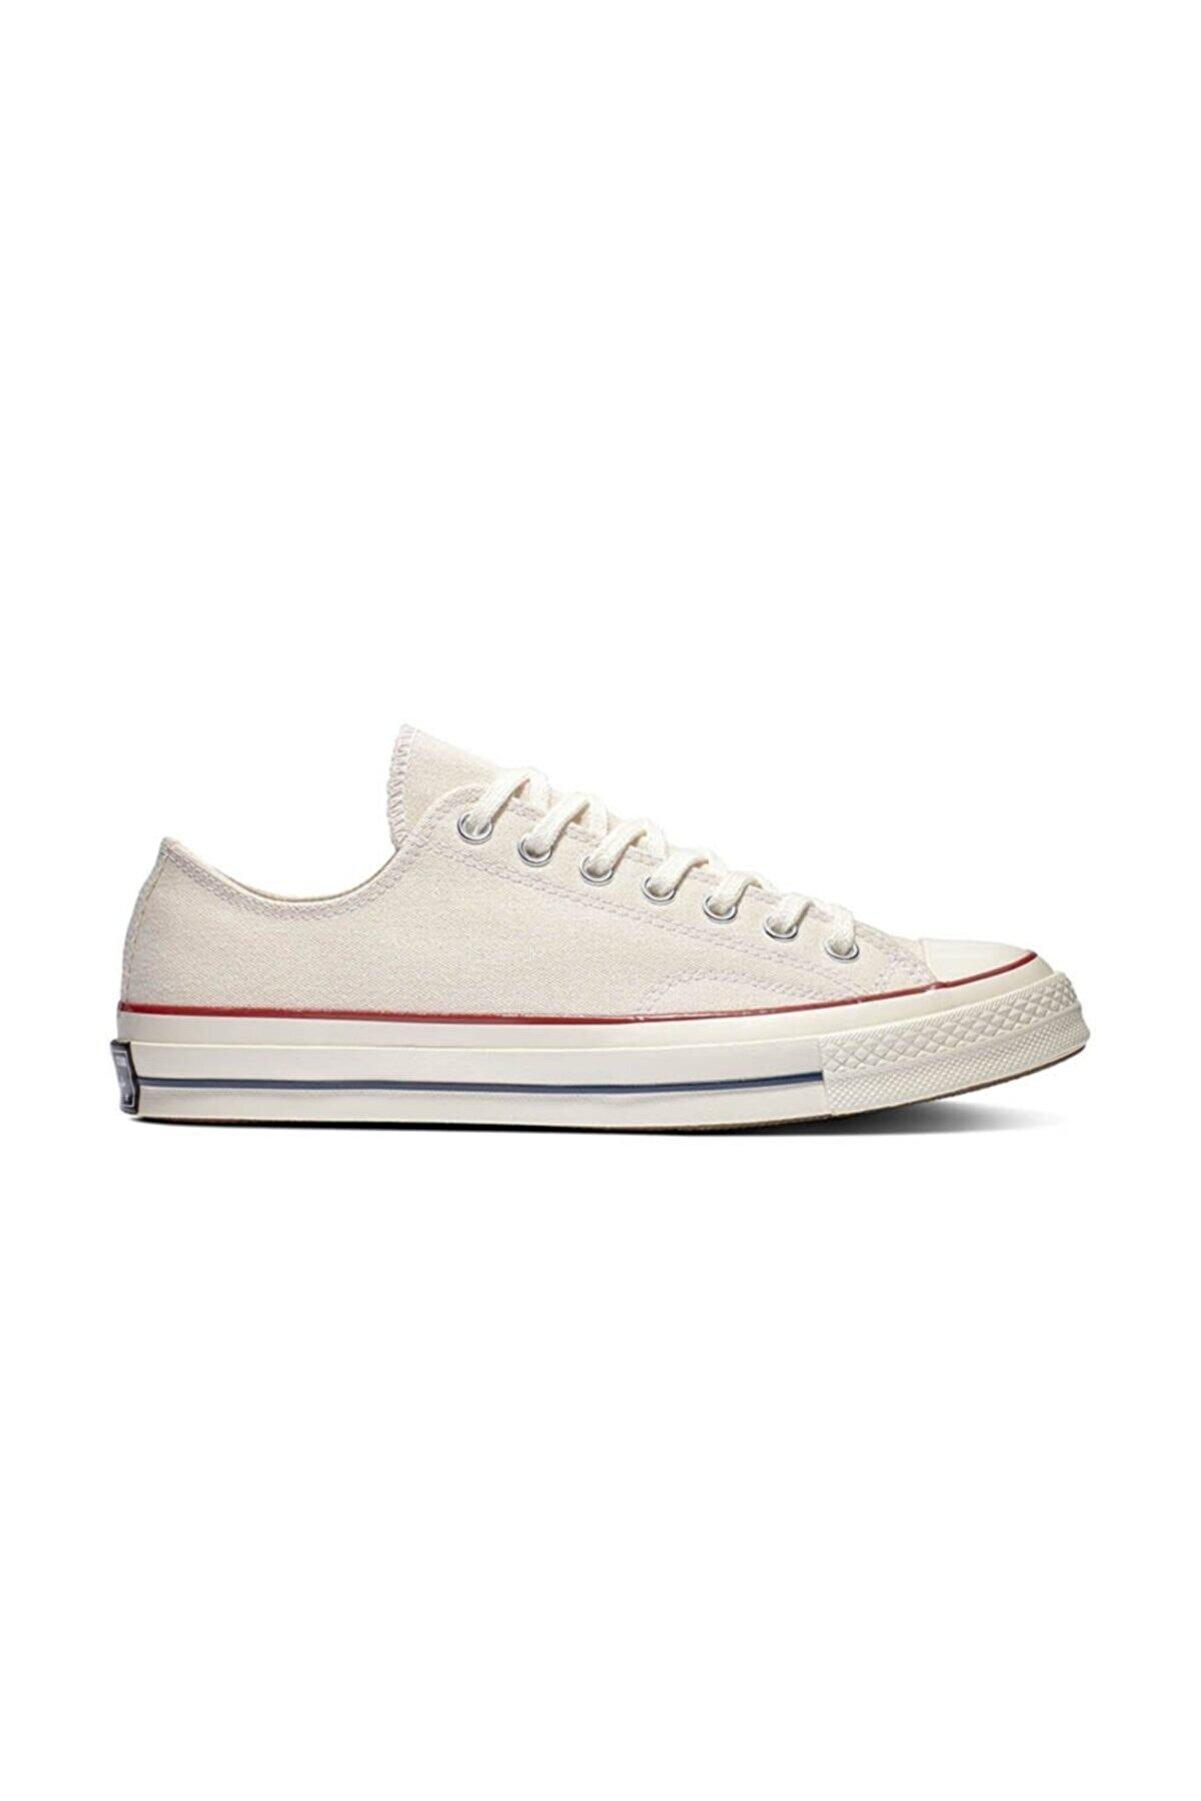 Odal Shoes Unisex Bej Ortopedik Şeritli Sneakers